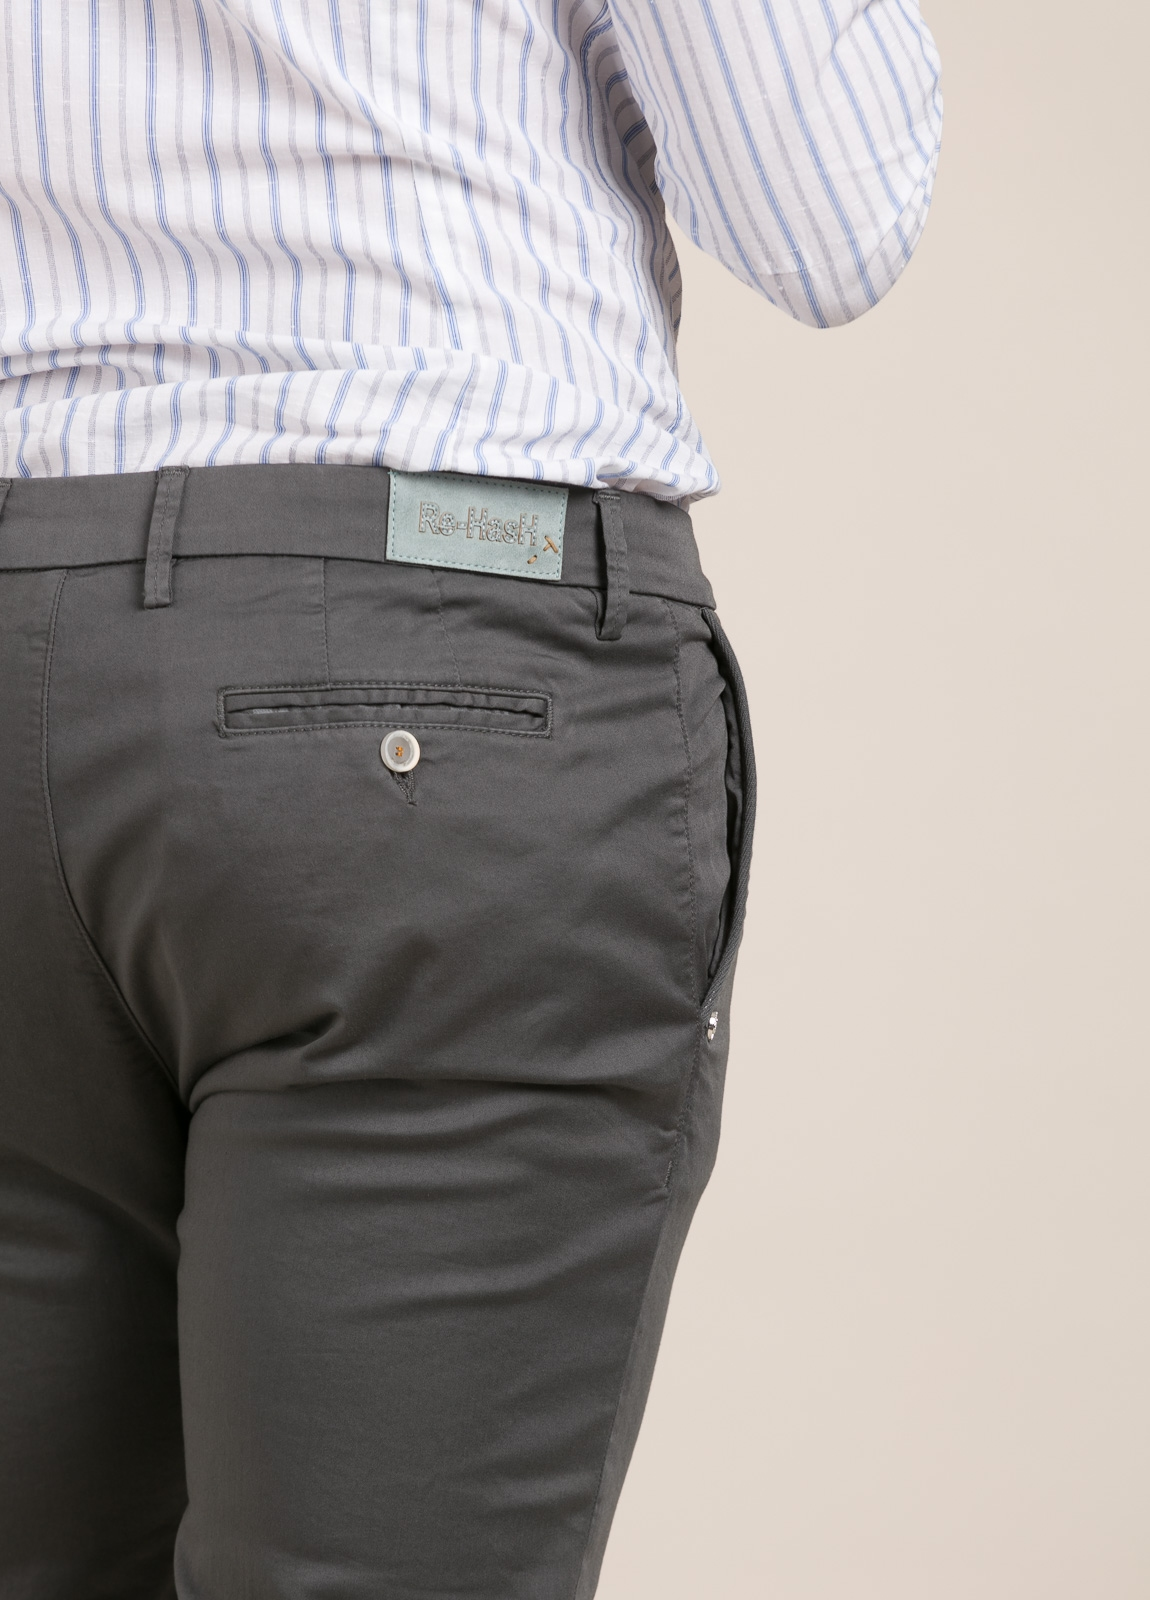 Pantalón sport RE-HASH slim fit gris - Ítem2